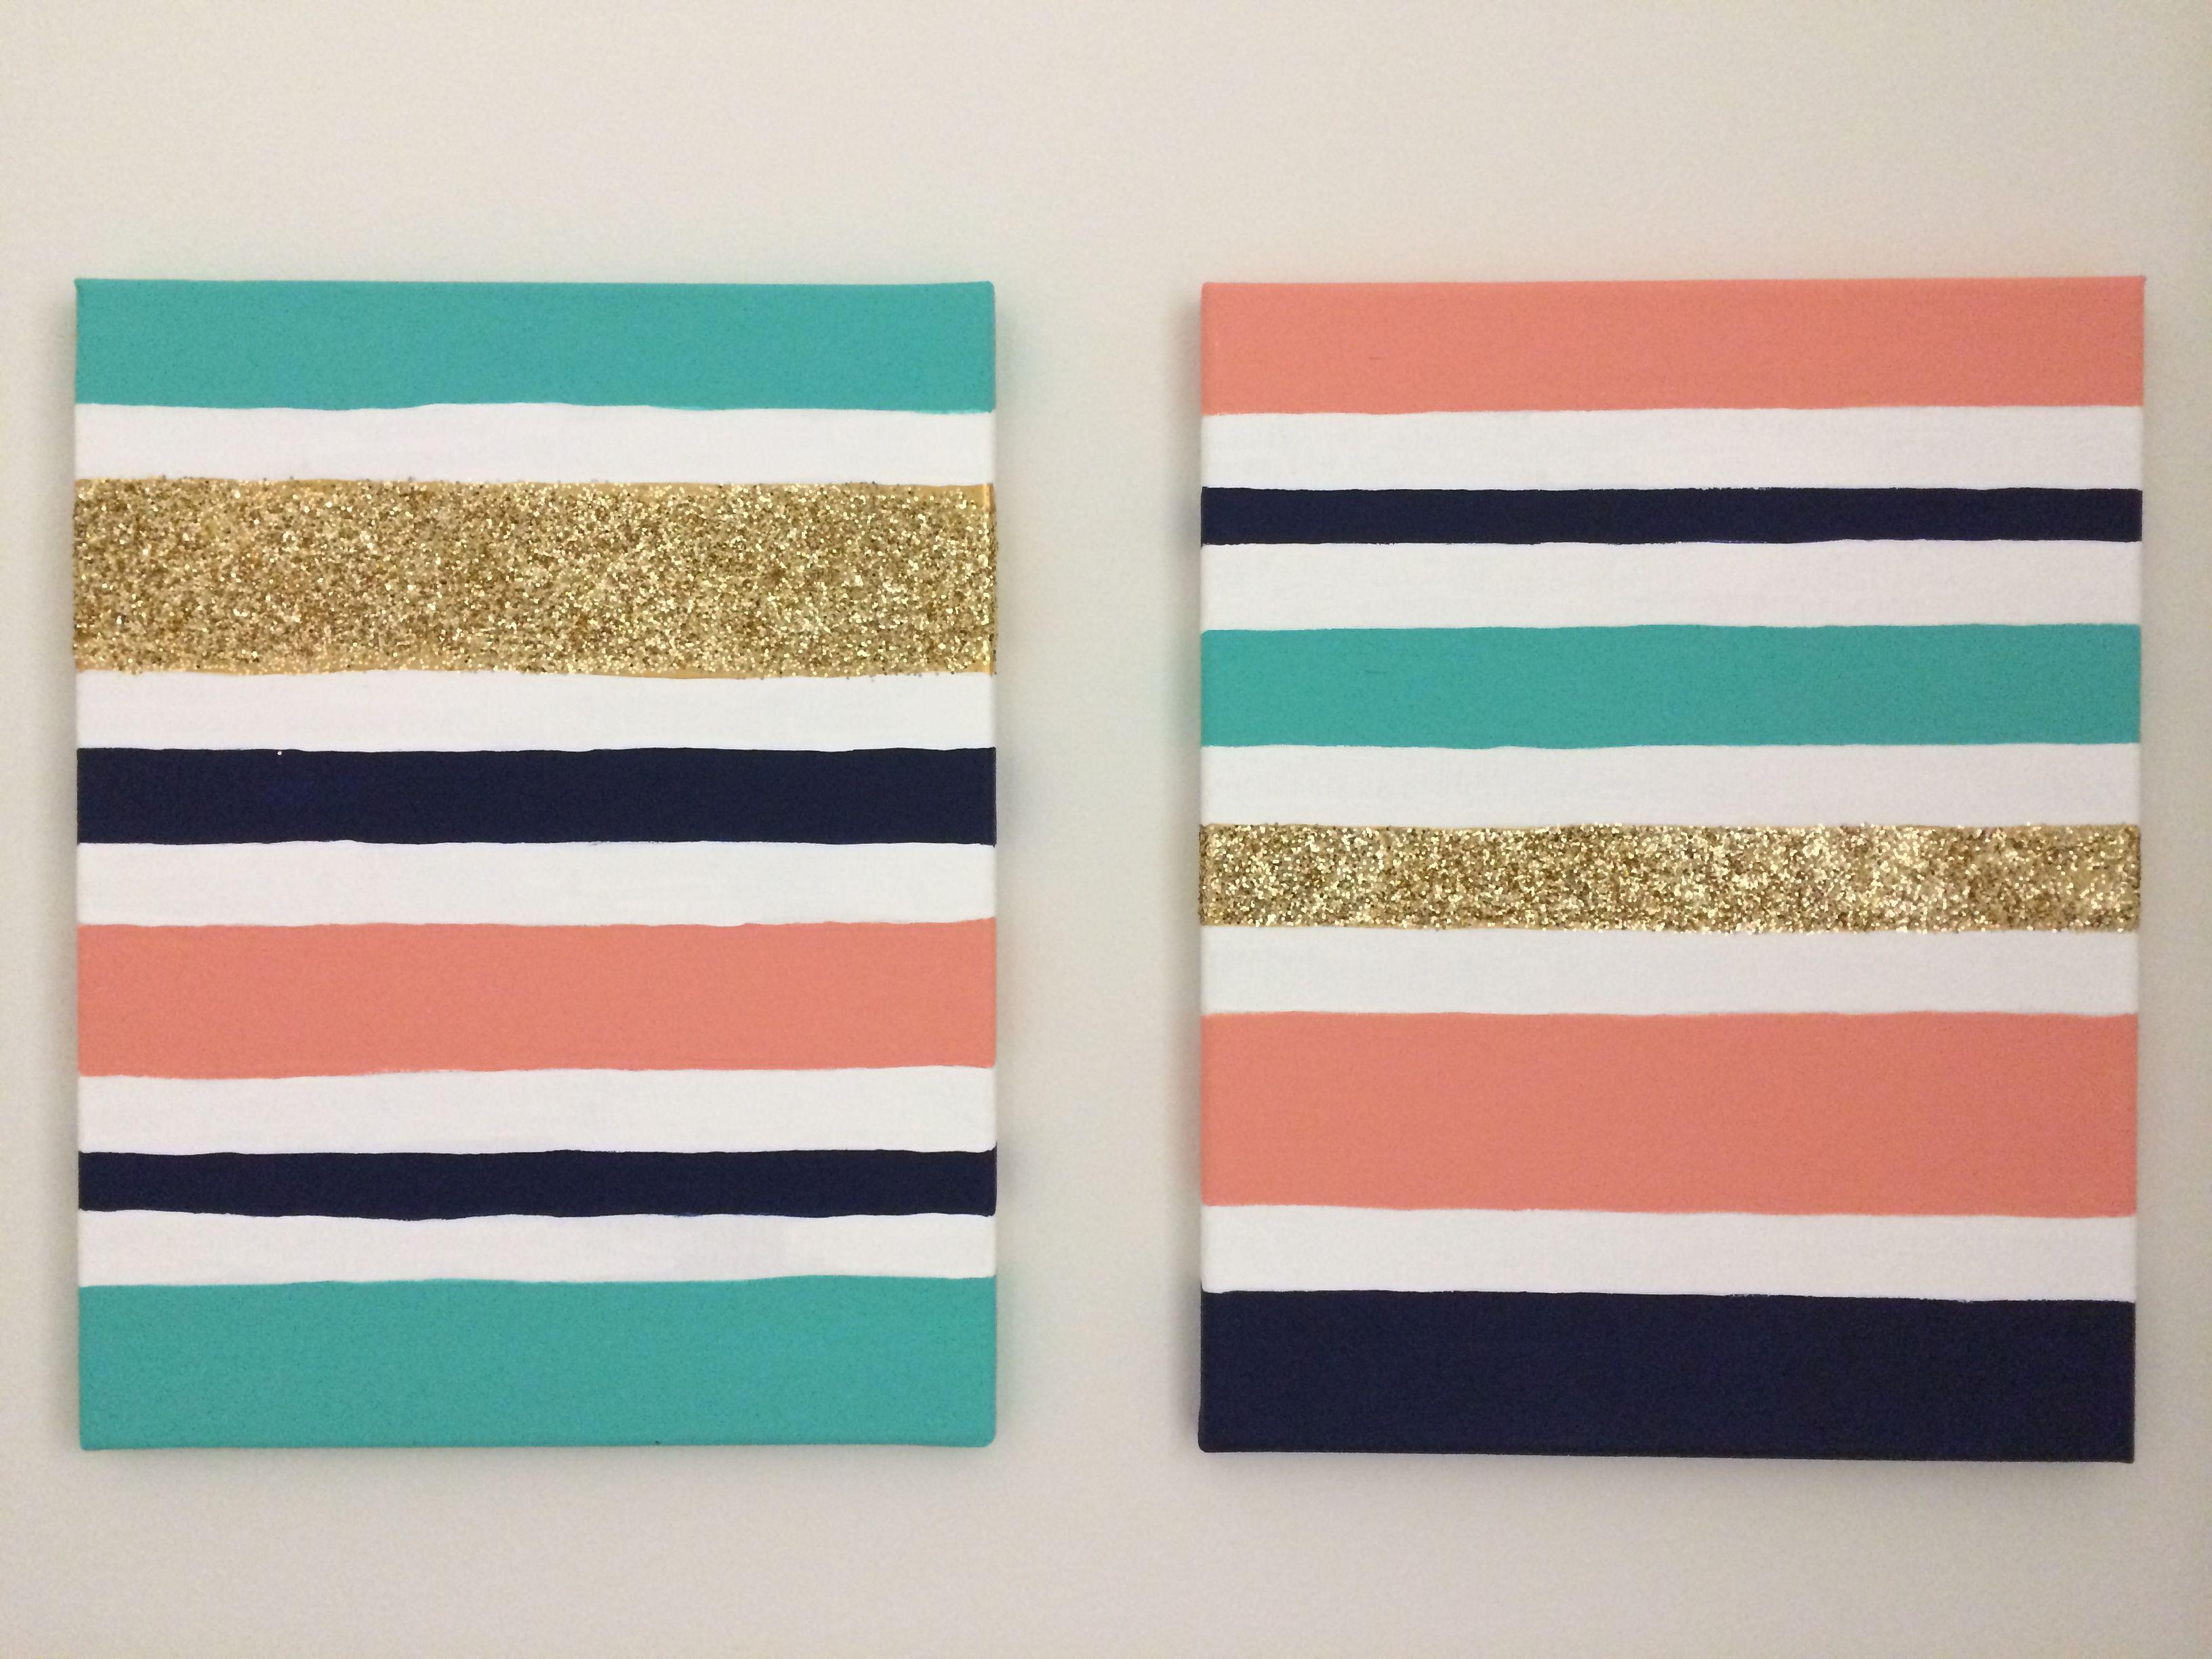 Diy stripes canvas glitter crafty pinterest canvas diy